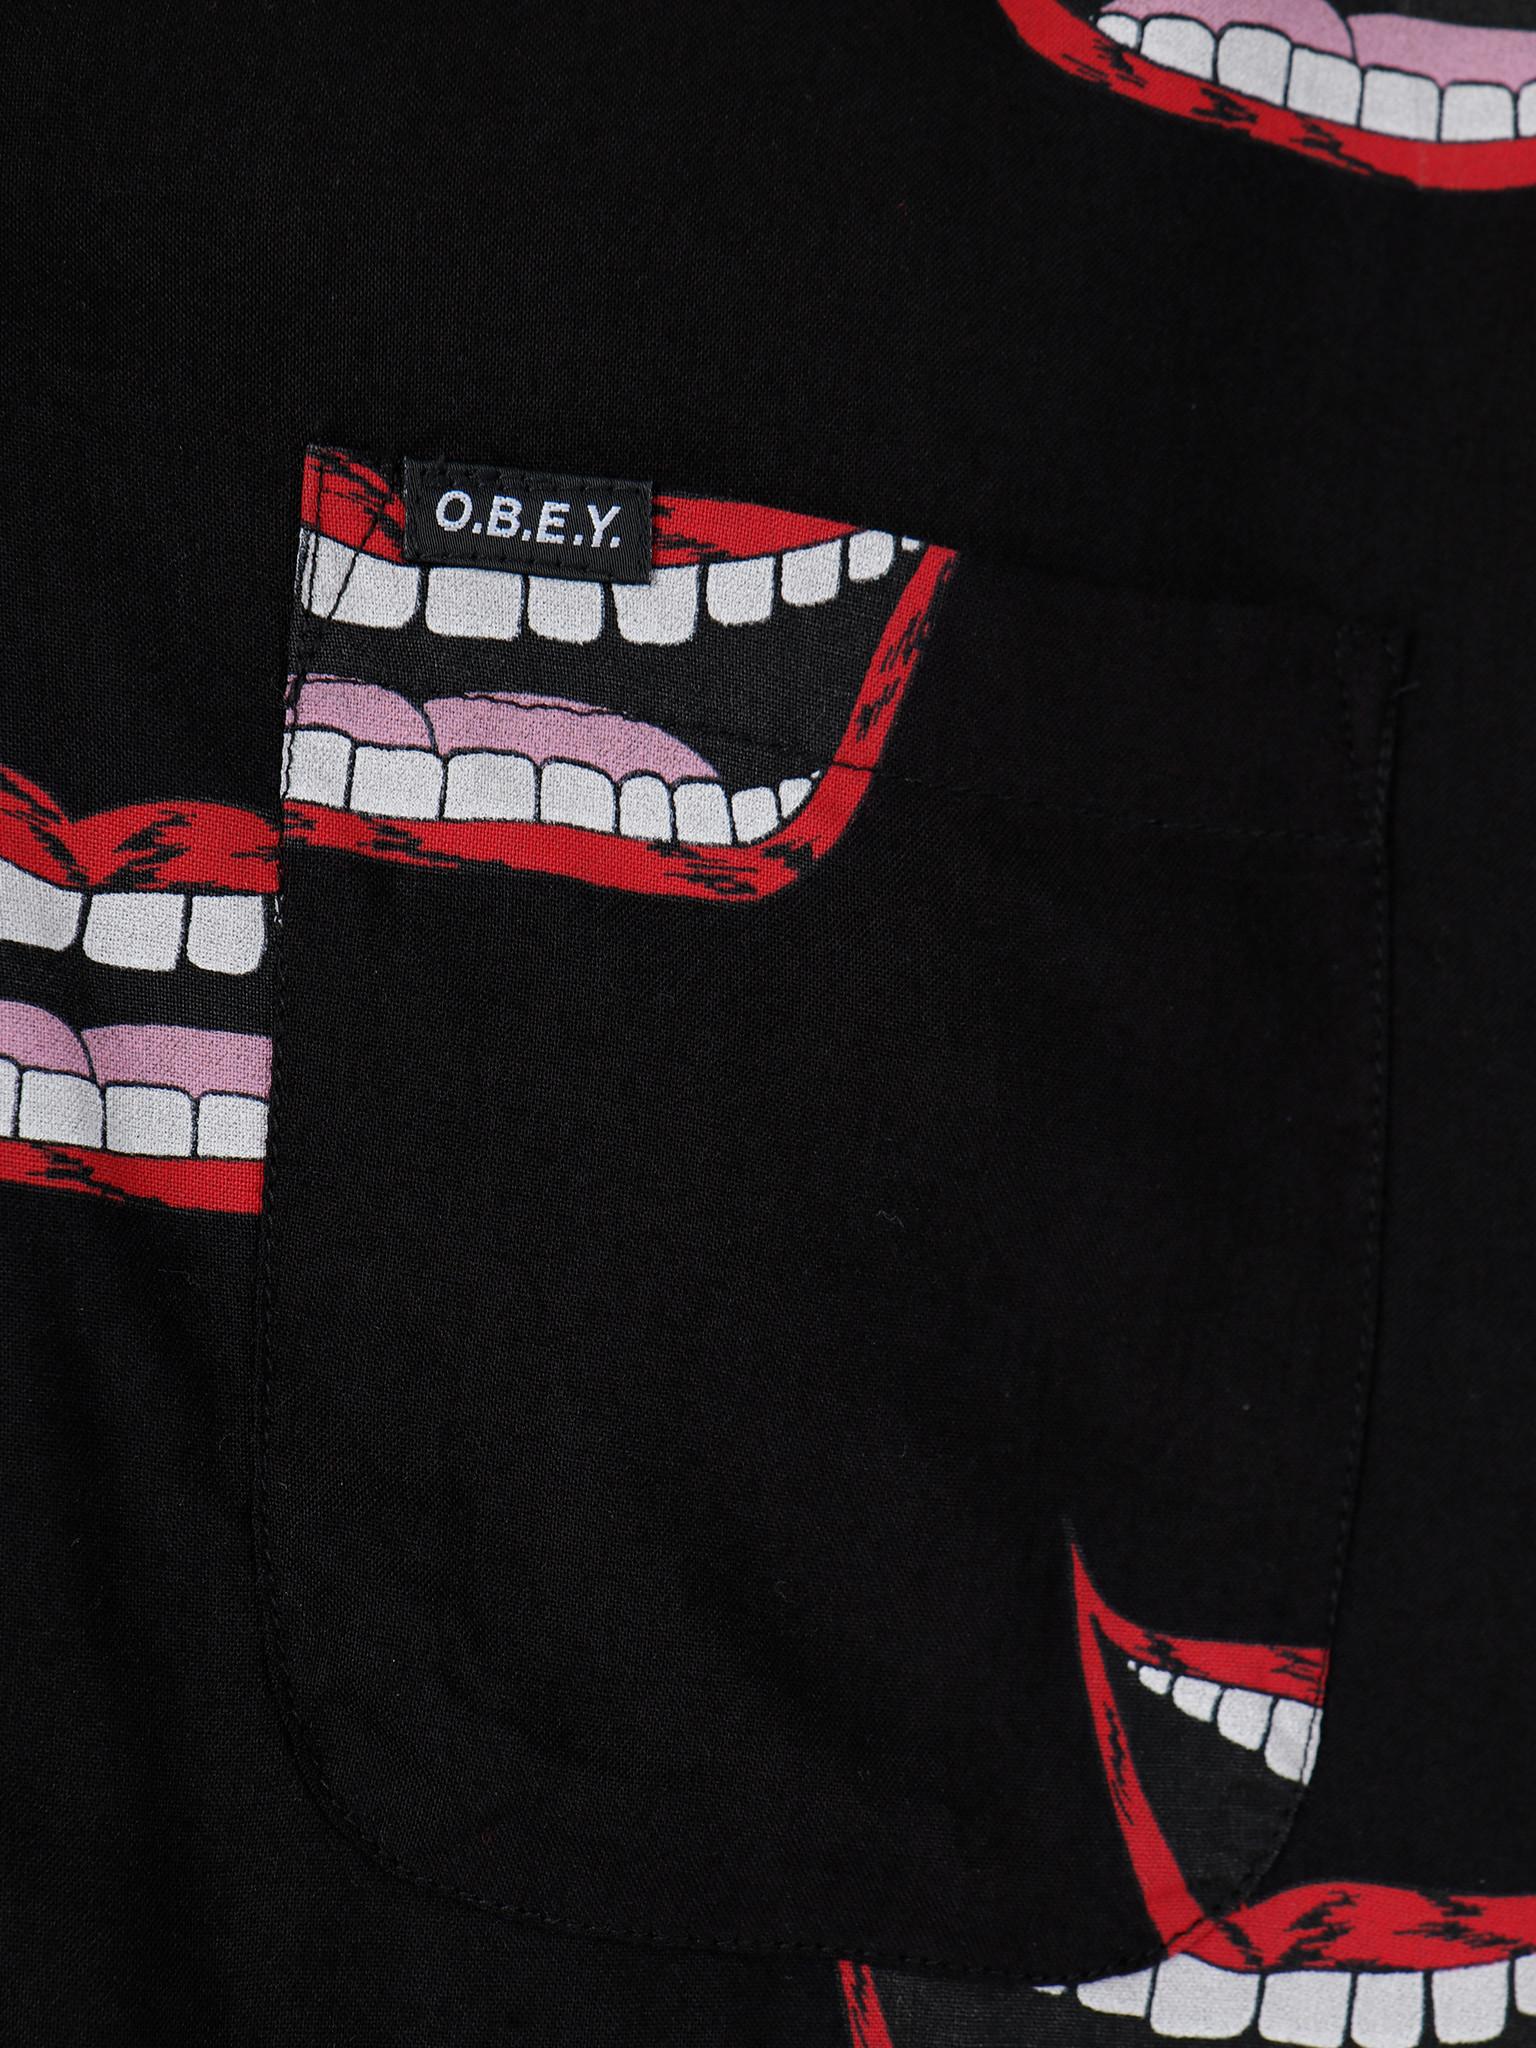 Obey Obey Shortsleeve Woven Black Multi 181210246-BKM